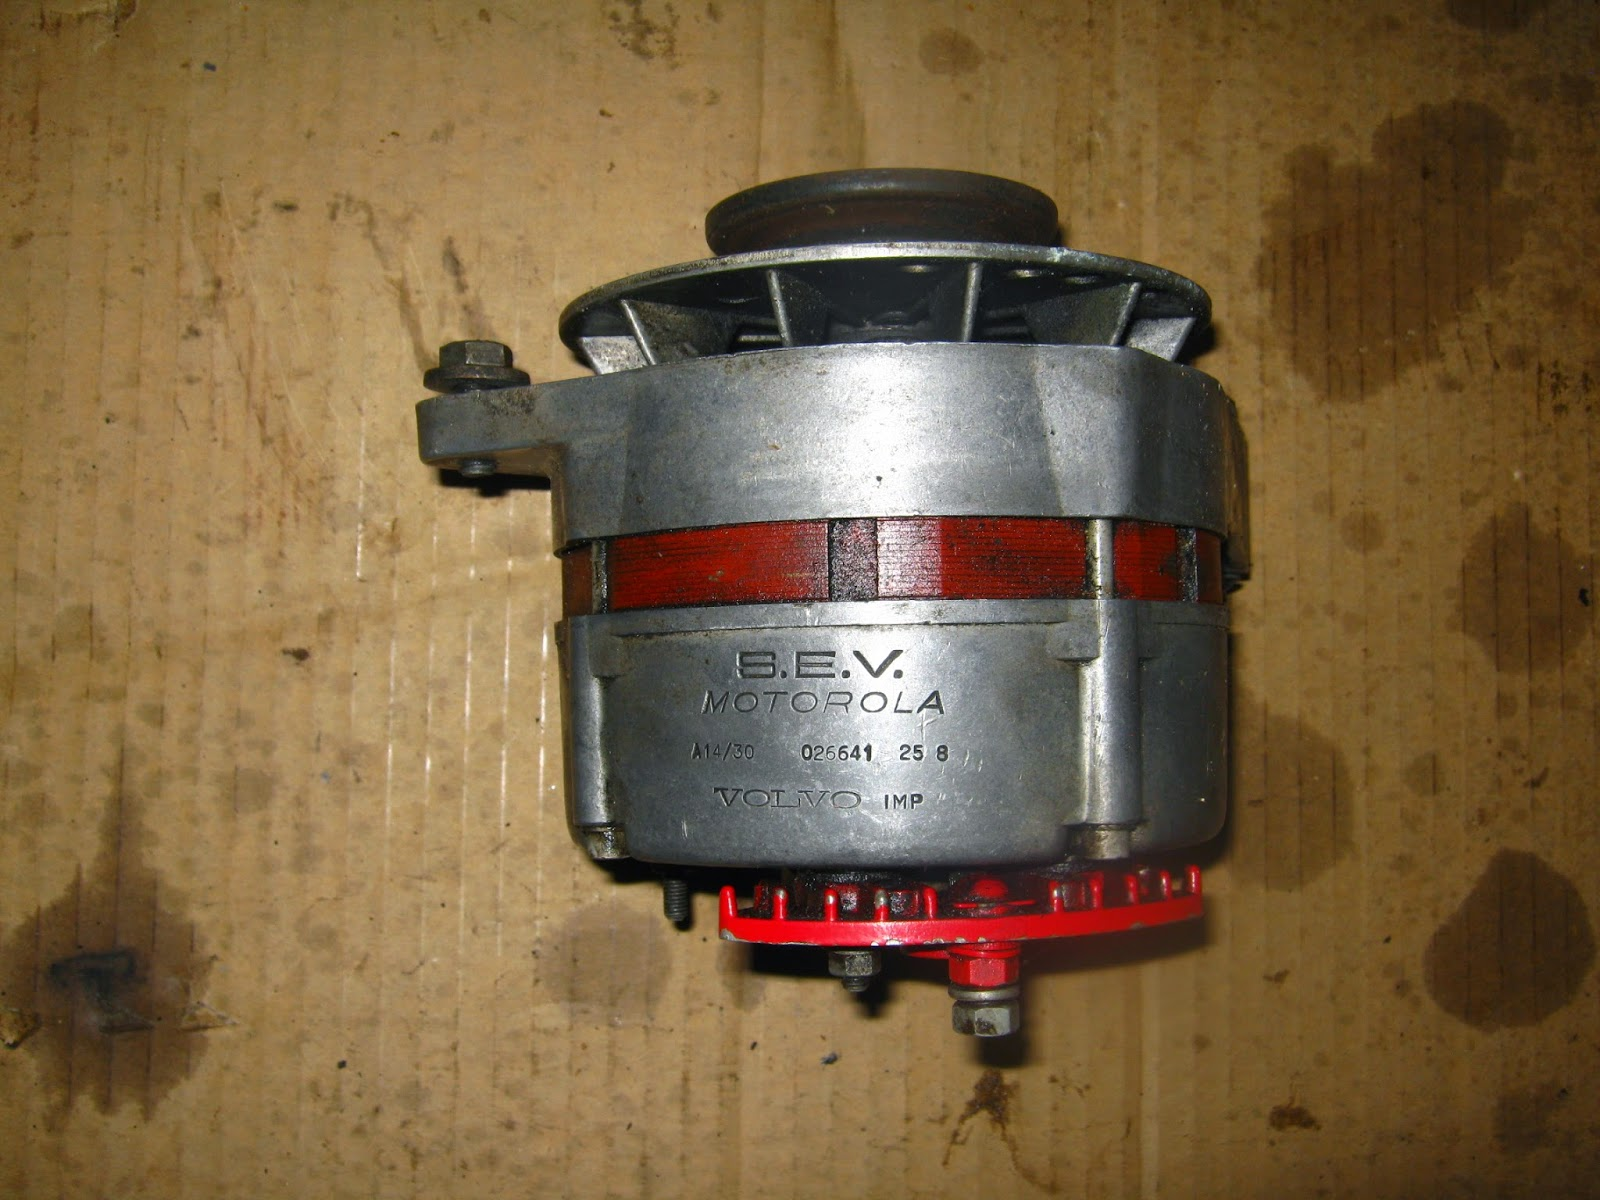 hight resolution of motorola alternator 30 amp volvo amazon p130